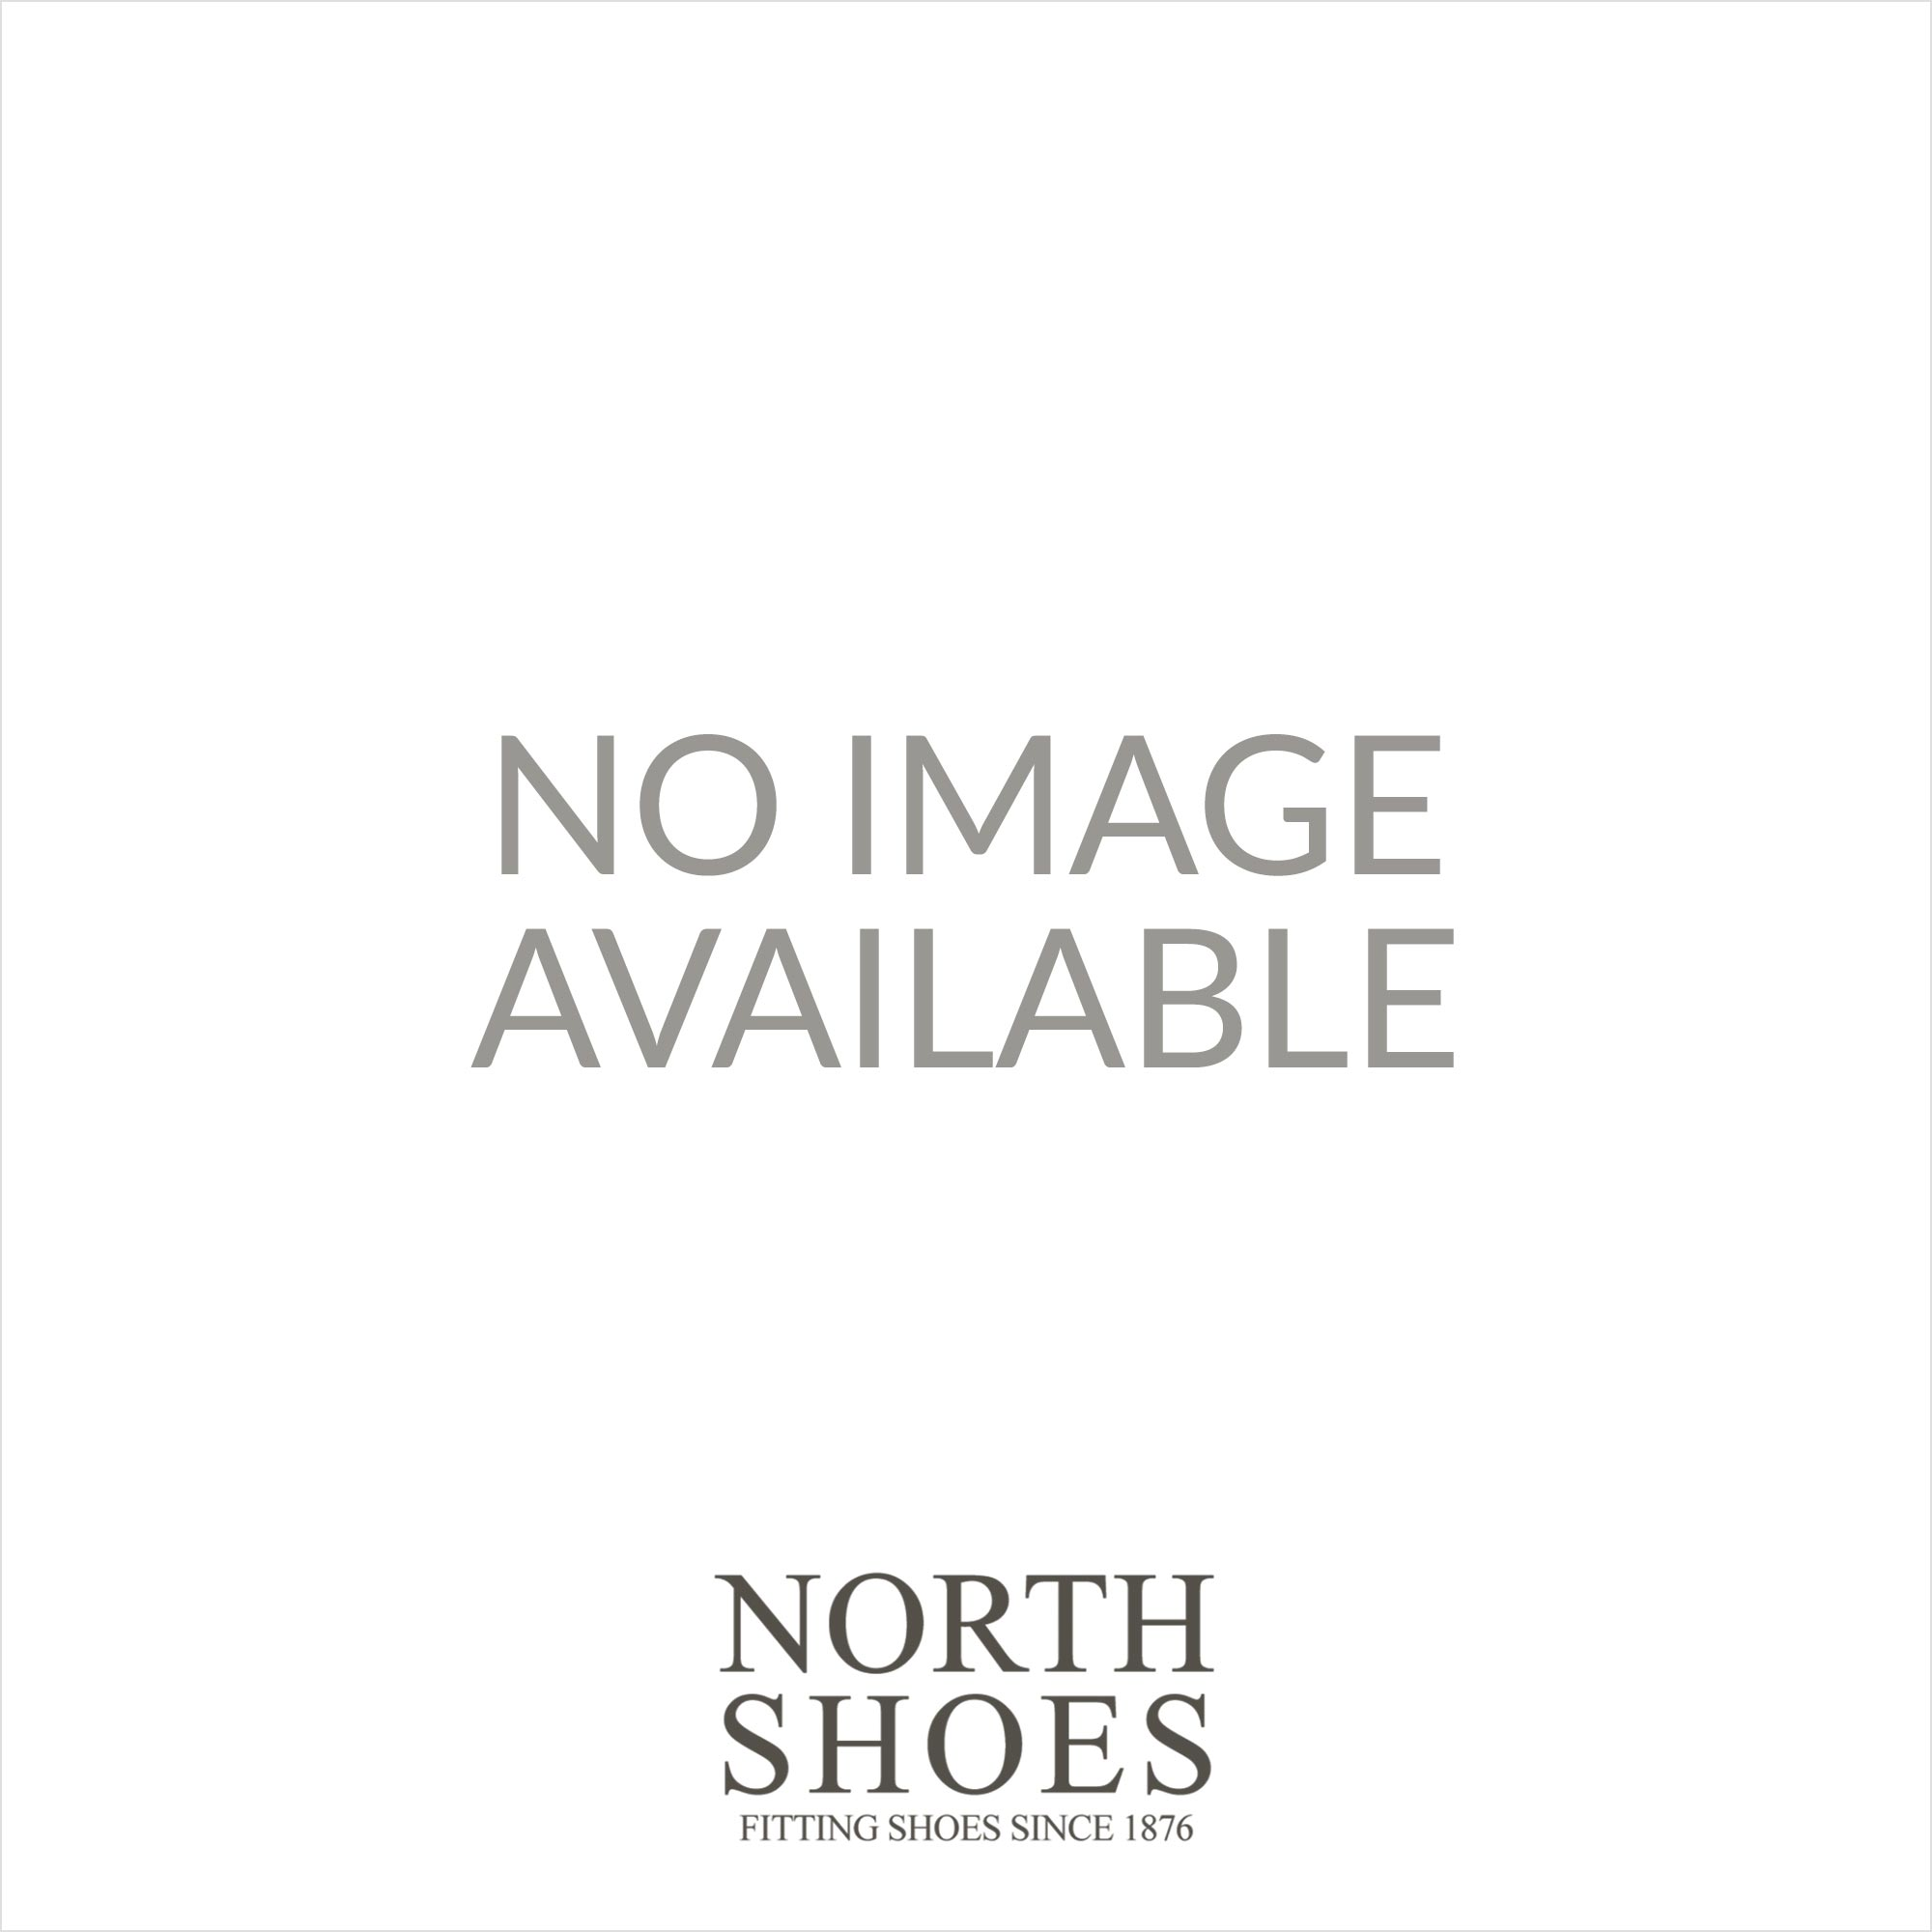 857c1b0f67a6 ... Skechers On The Go 600 - Monarch 15306 Black Knitted Mesh Womens Slip  On Mule Sandal